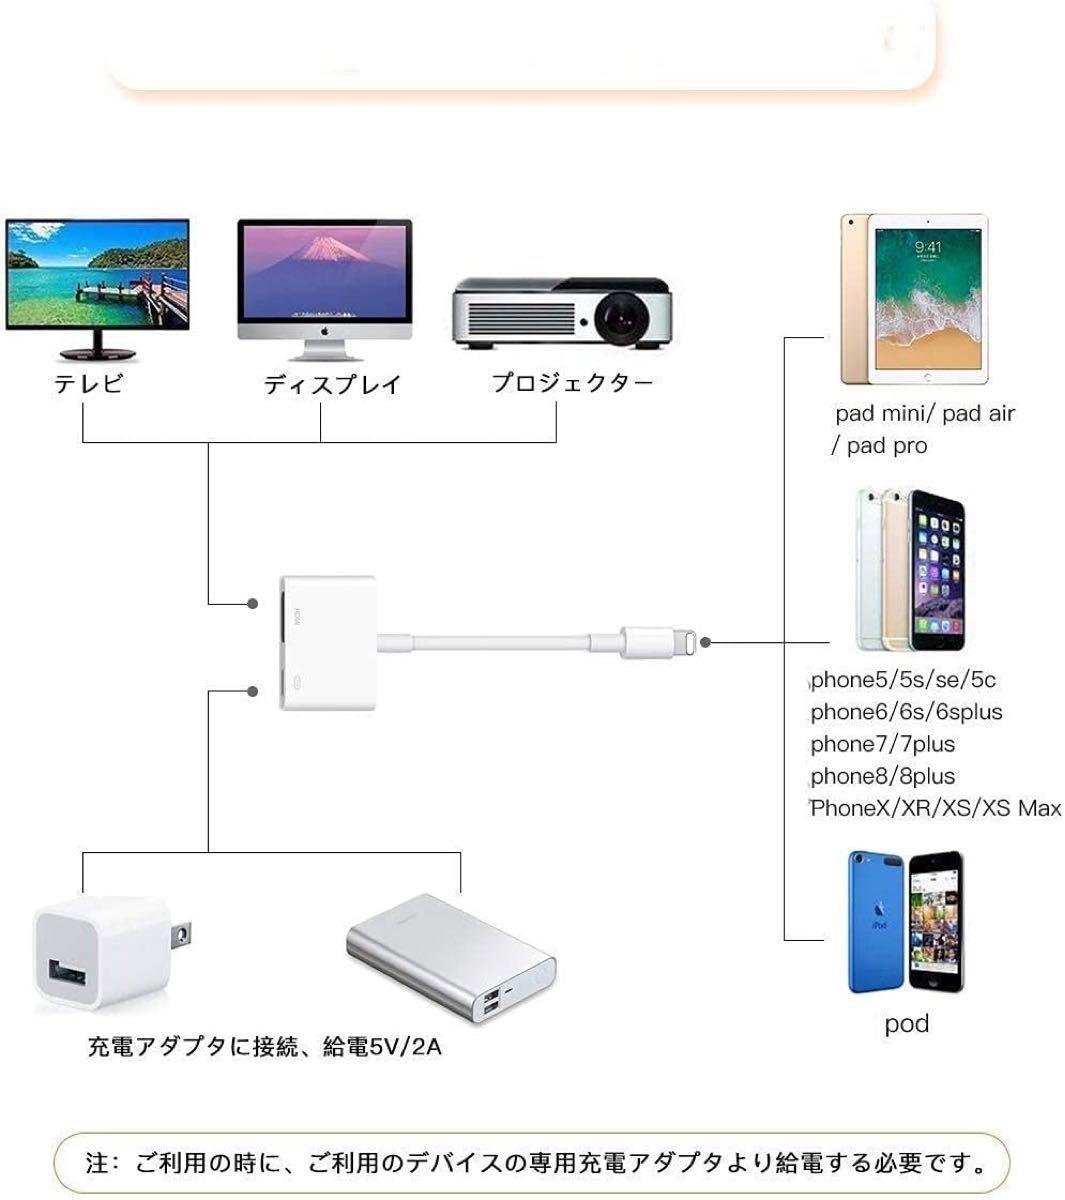 HDMI アダプター ライトニング ipad/iphone HDMI変換アダプタ